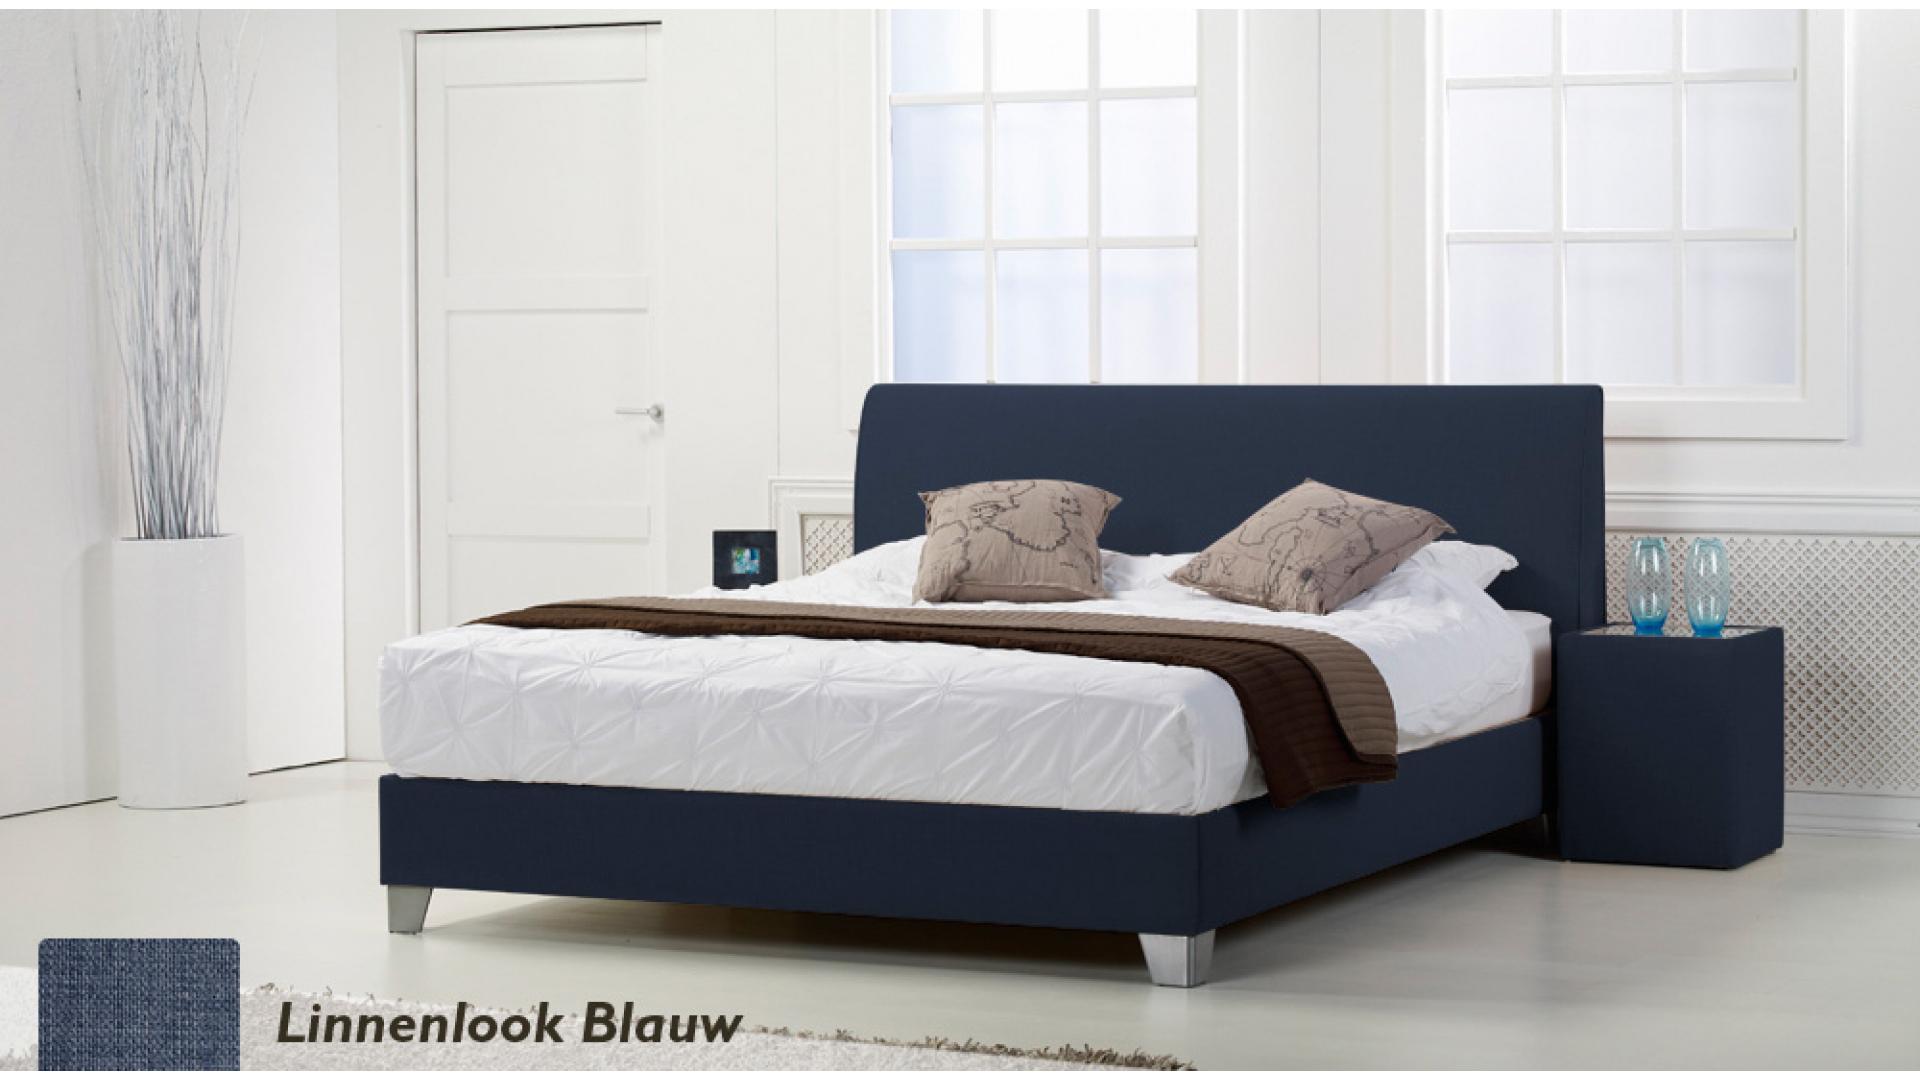 waterbed basic box pro linnenlook blauw boxspring-look